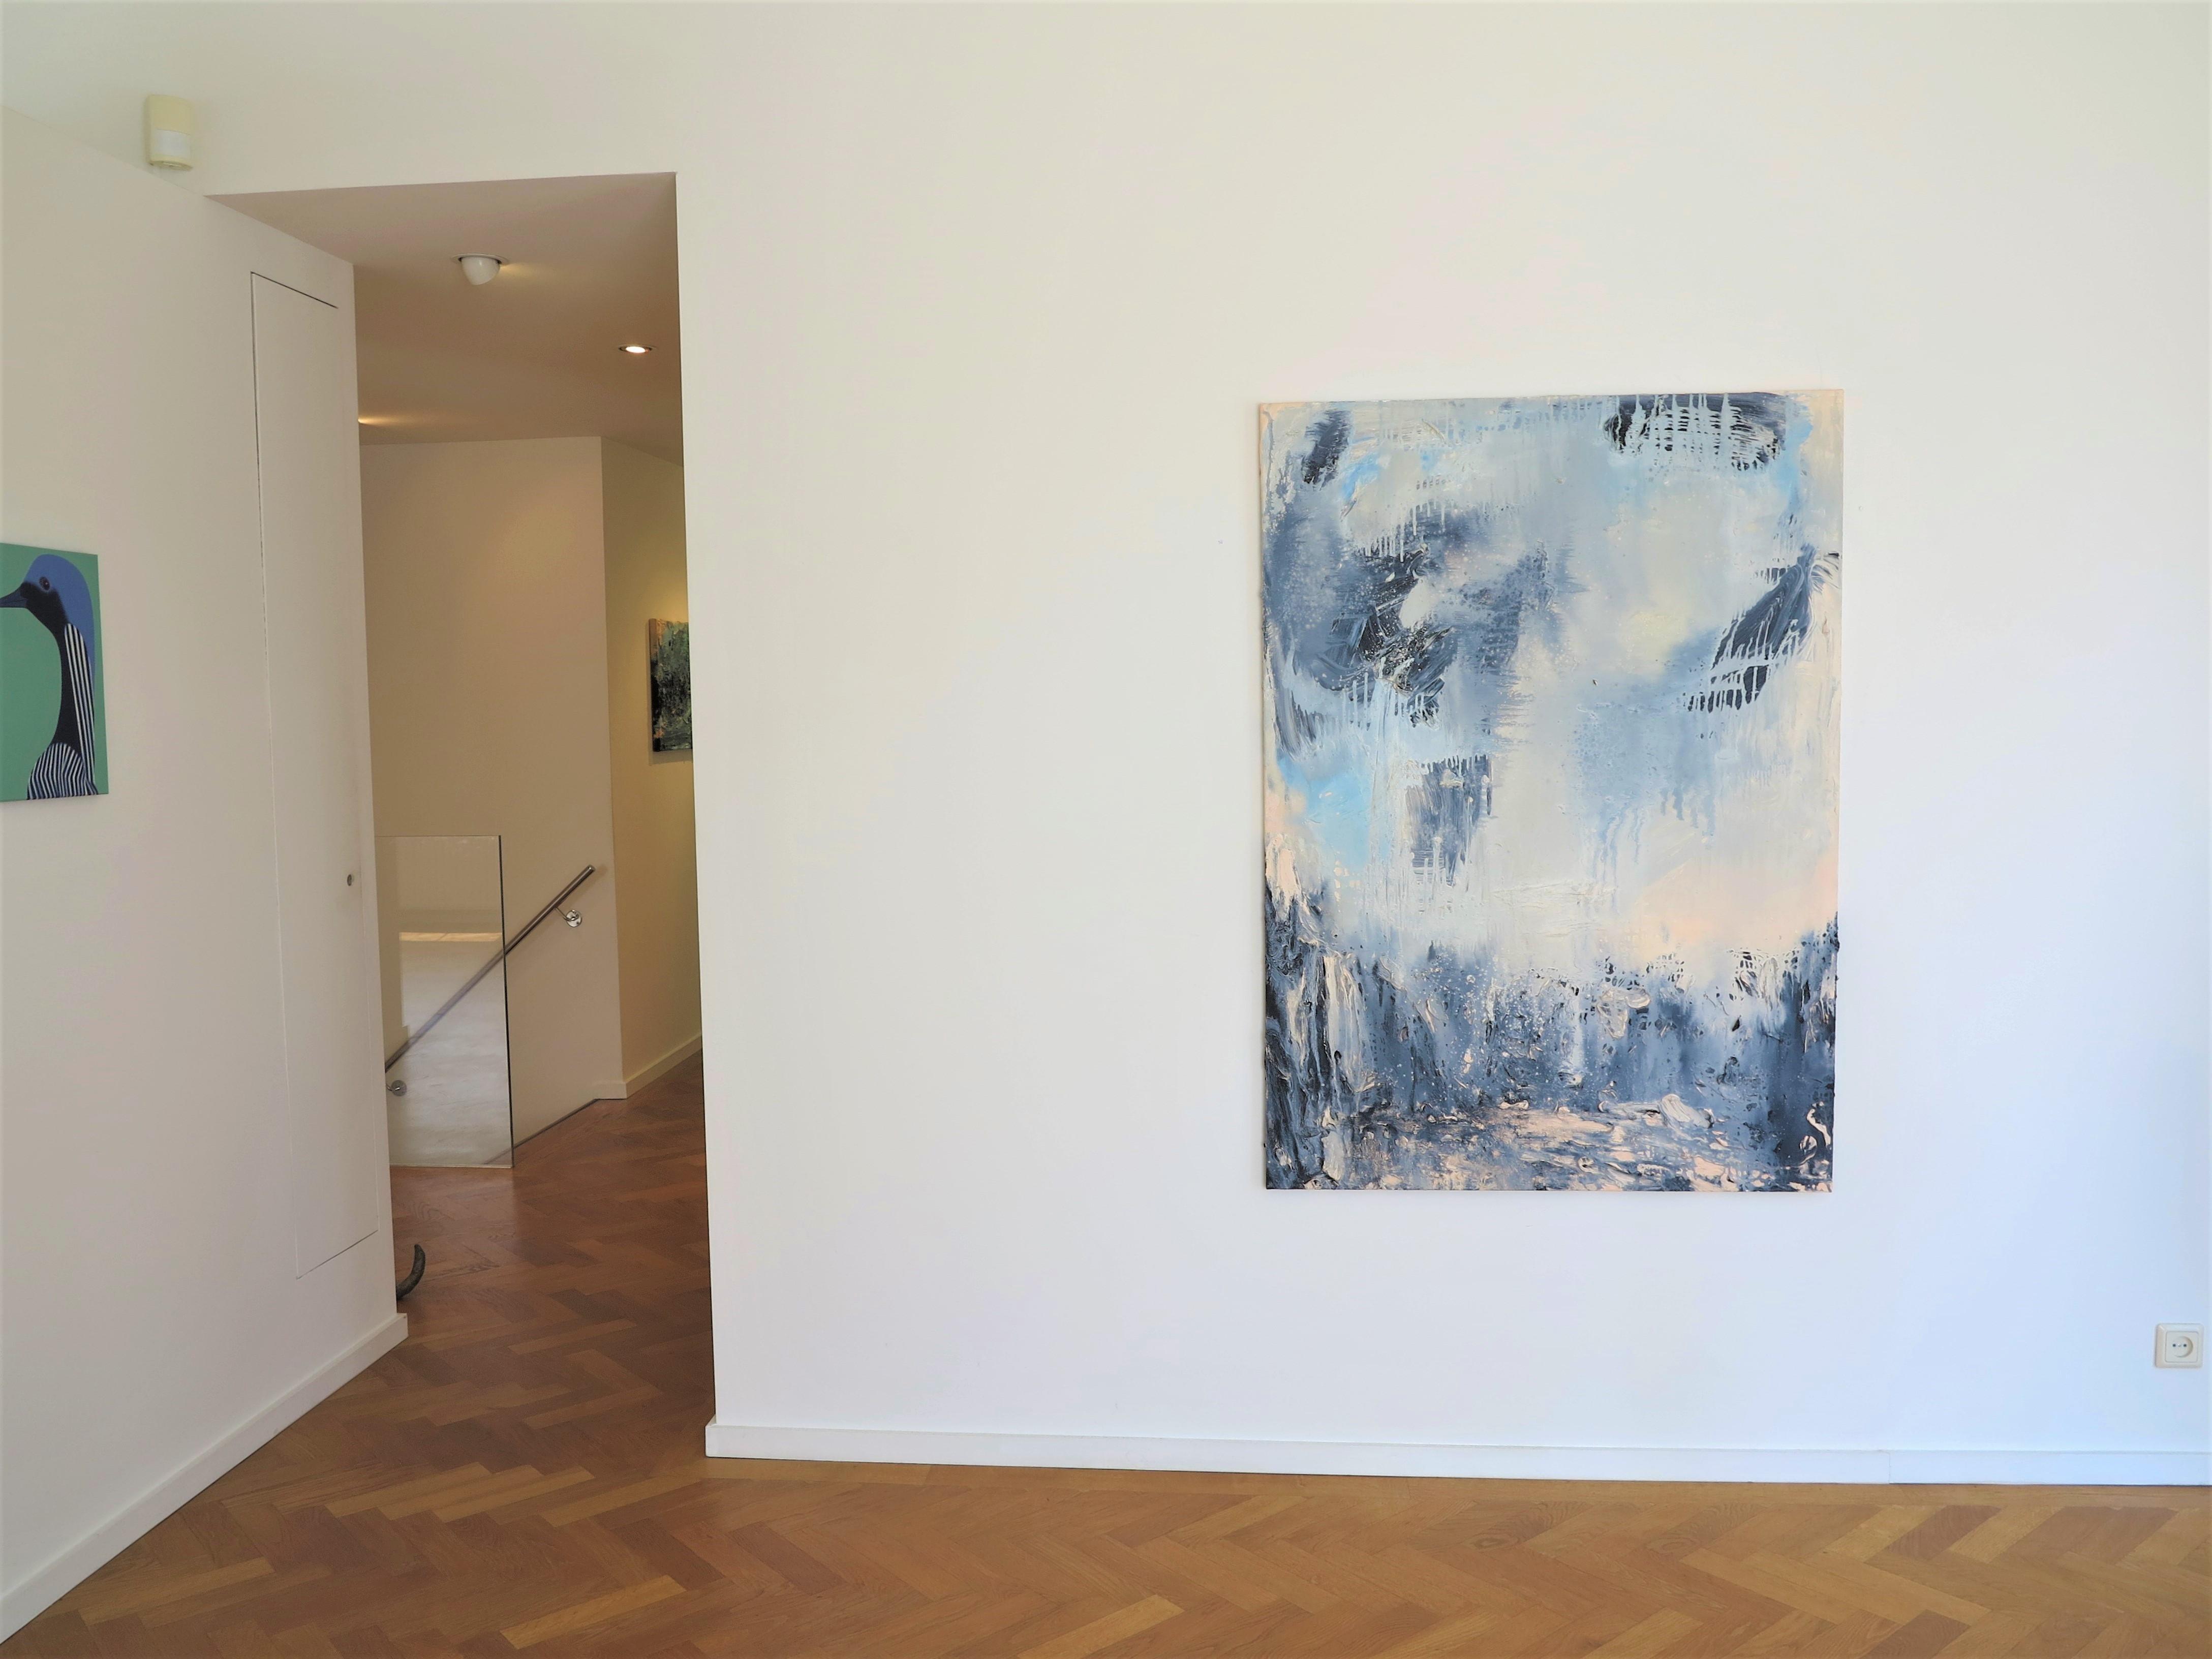 """end of season"", groupshow Jan van Hoof Galerie, 's-Hertogenbosch (2021)"